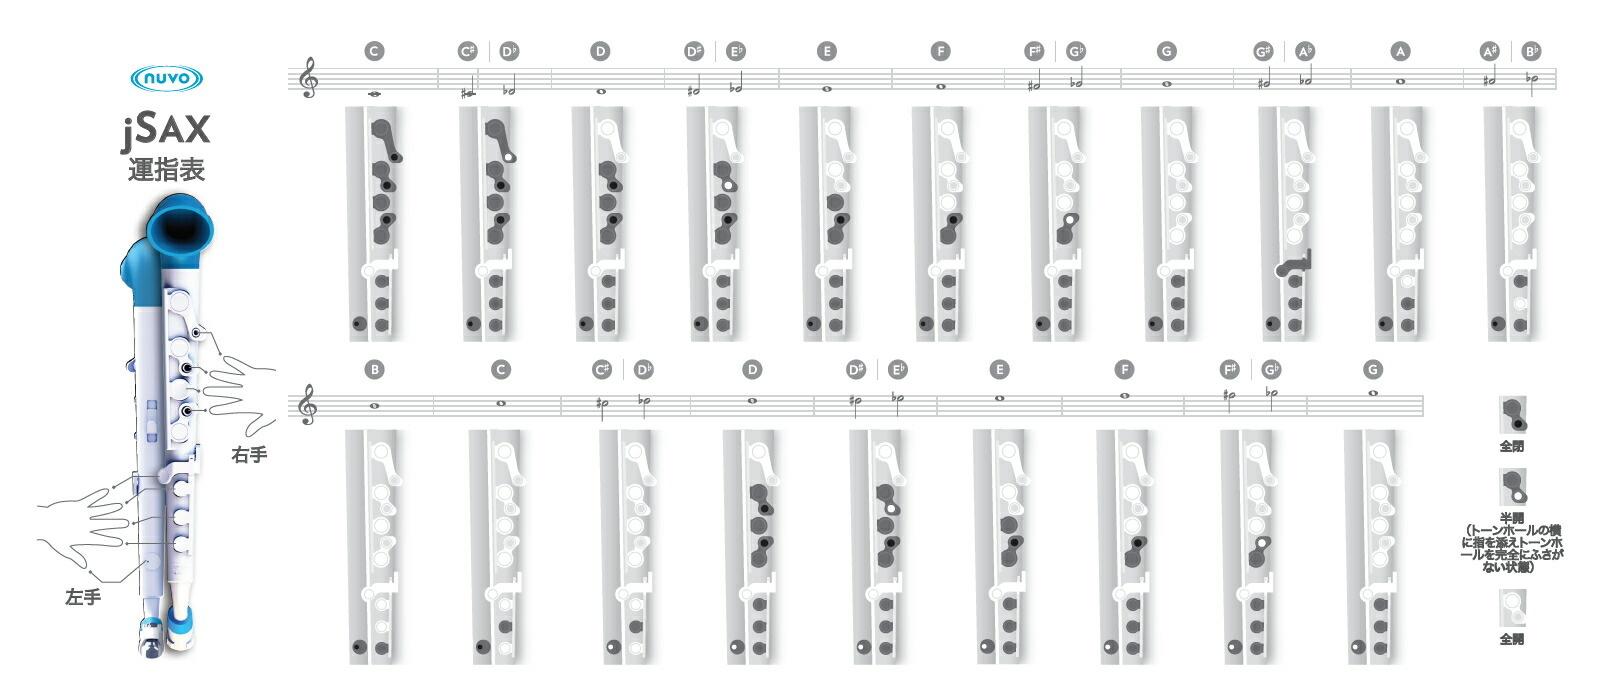 Nuvo プラスチック製 サックス jSAX Ver2.0 【ヌーボ ジェイサックス プラスチック楽器】